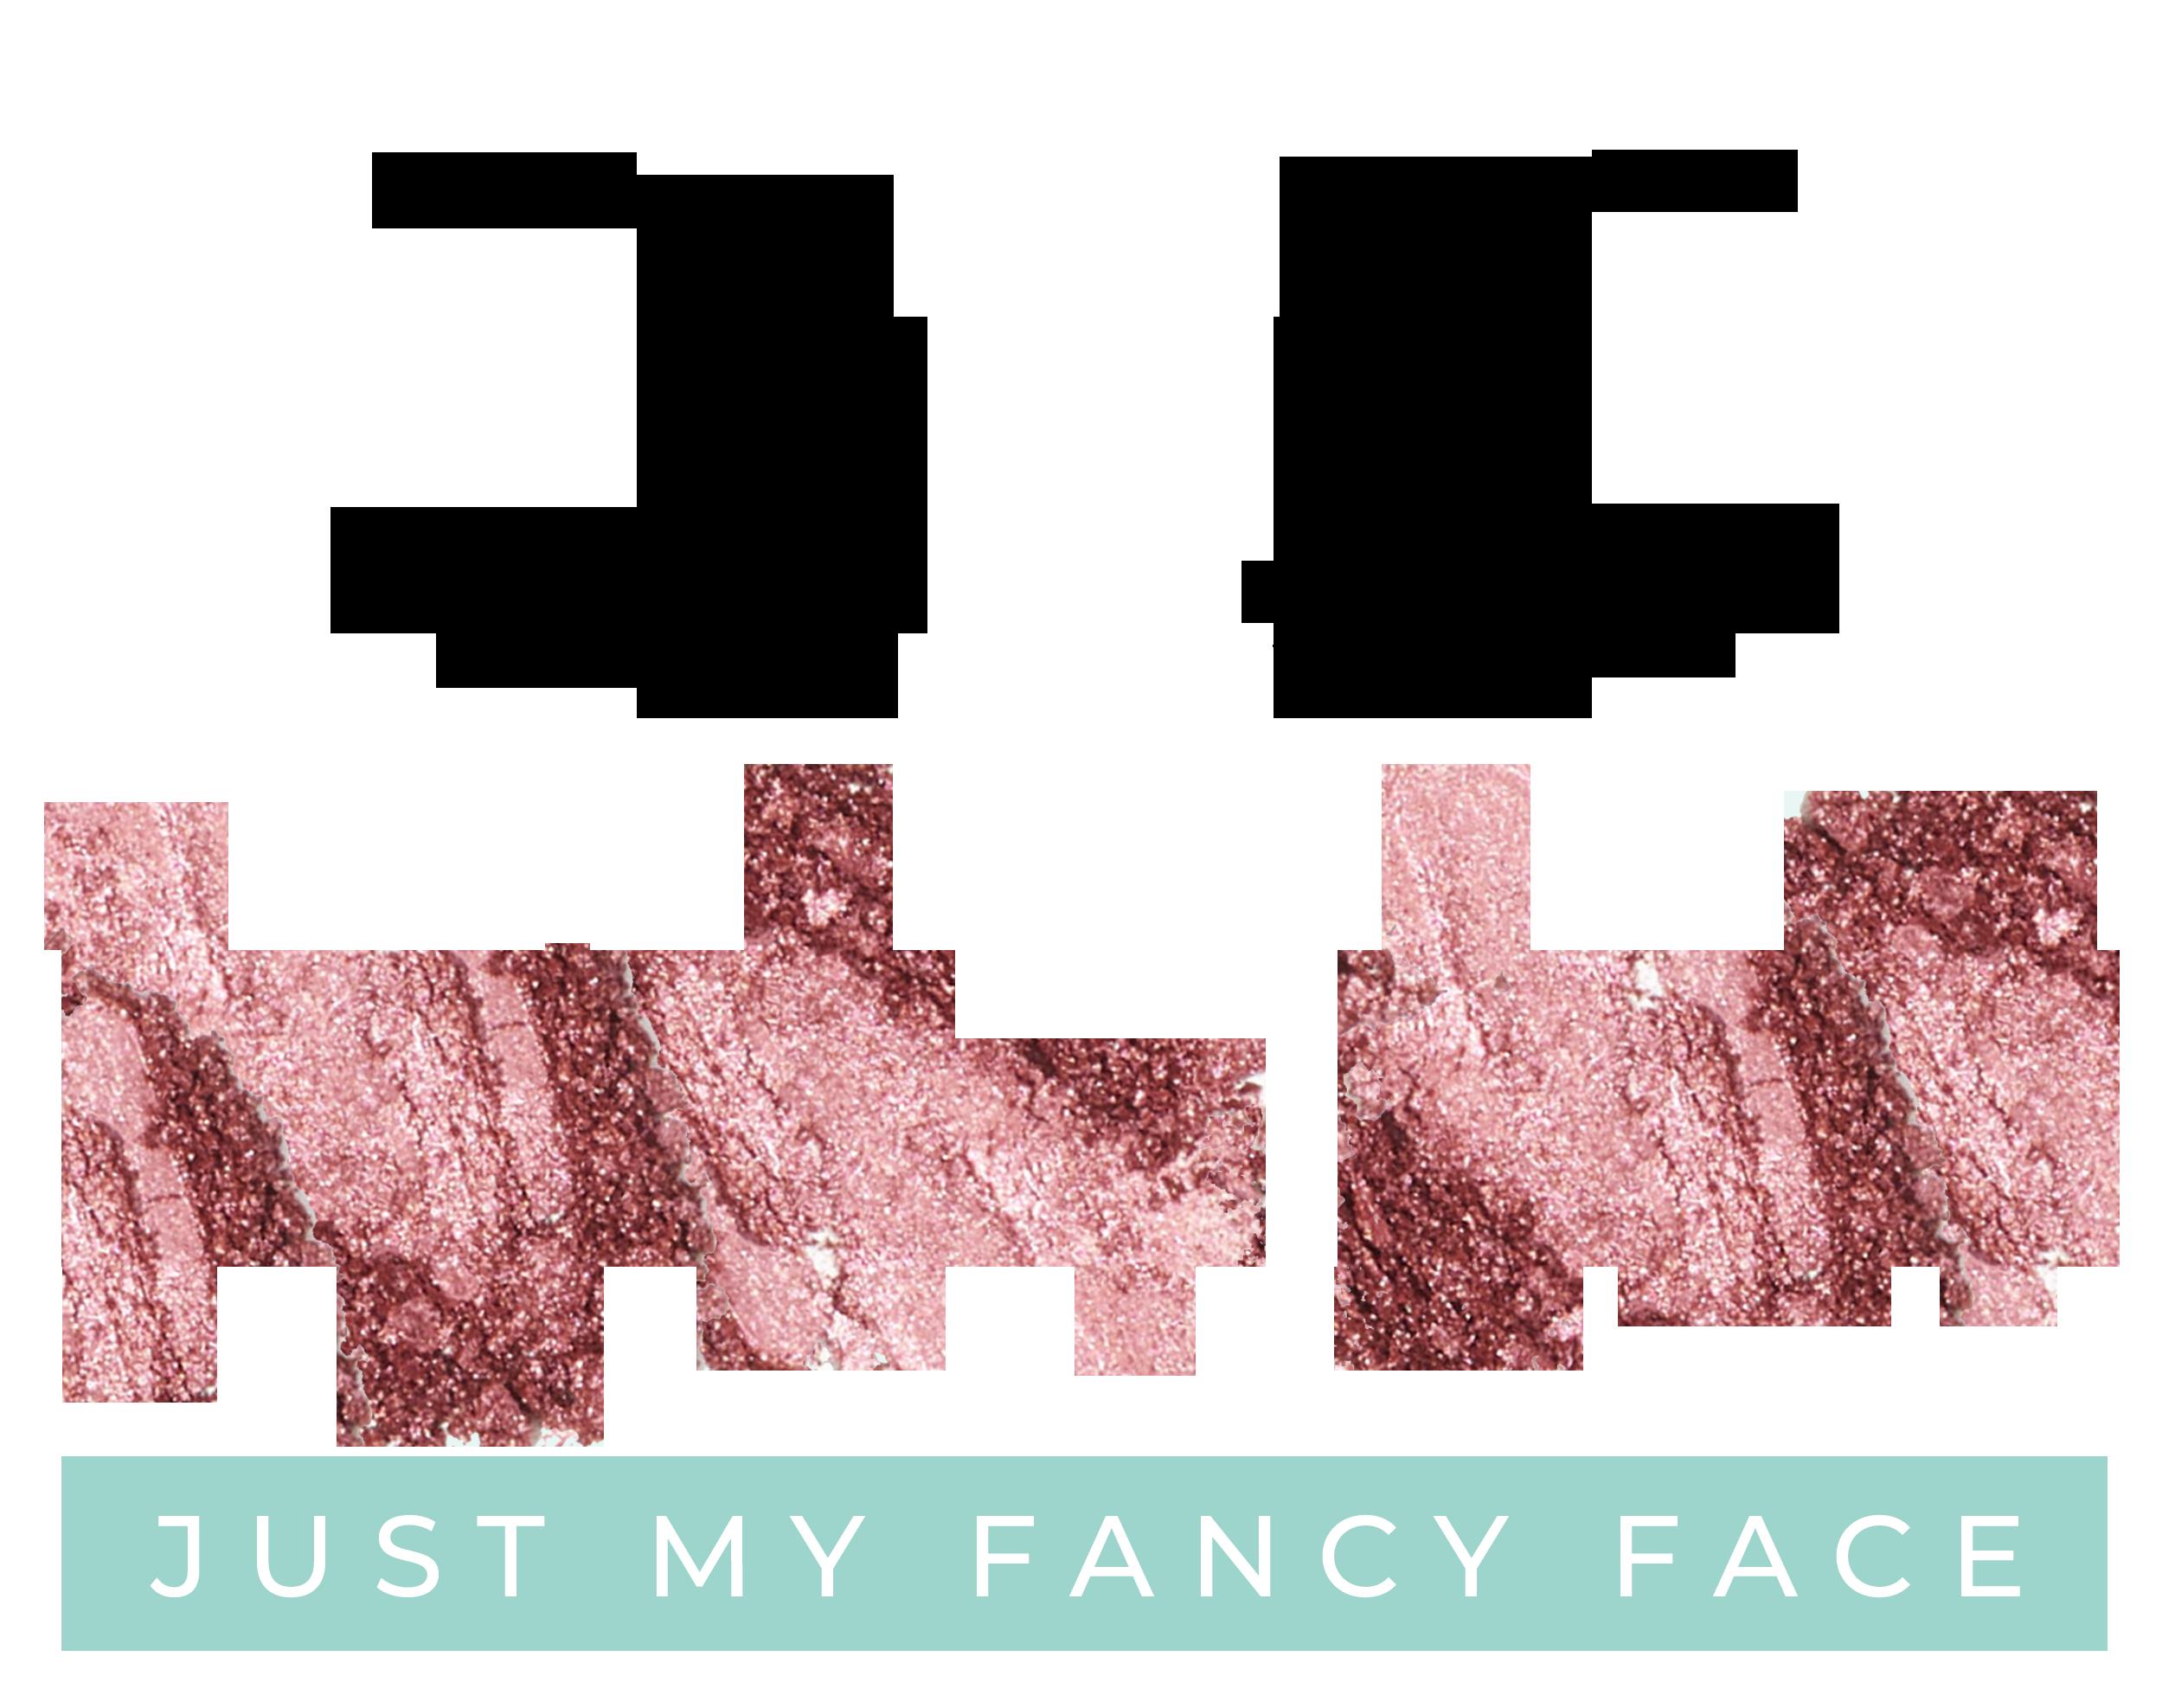 TASHAHILL4.8